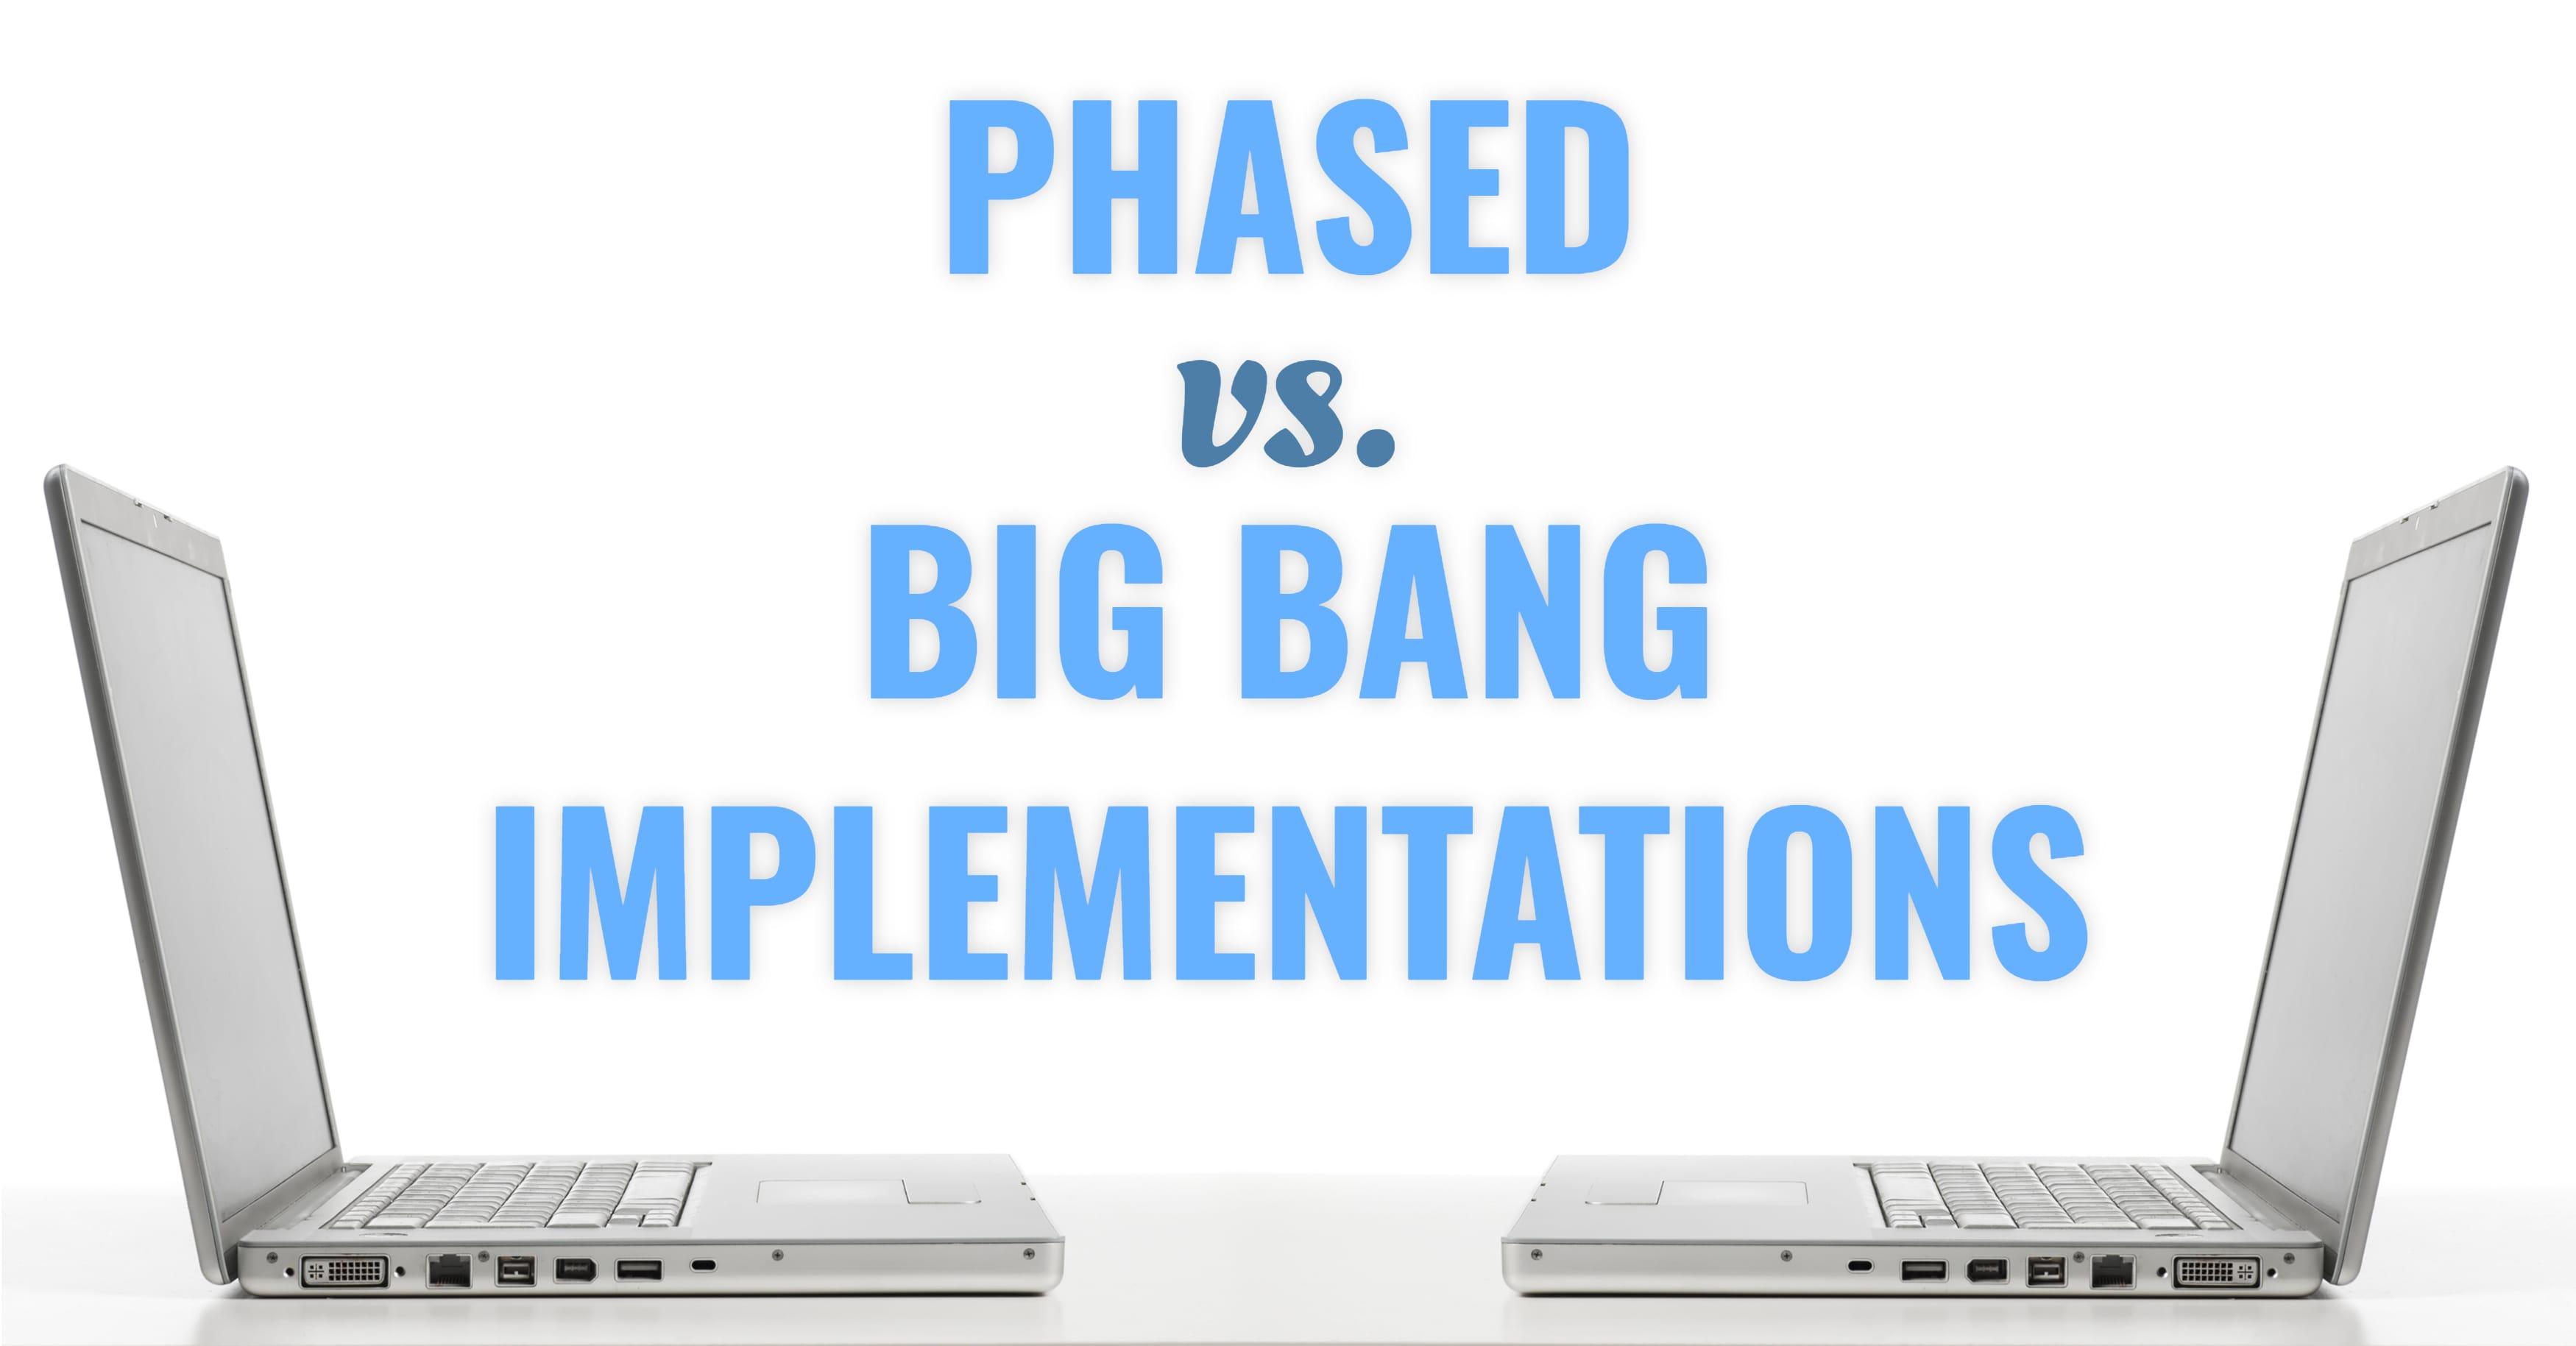 Phased Big Bang Implementations